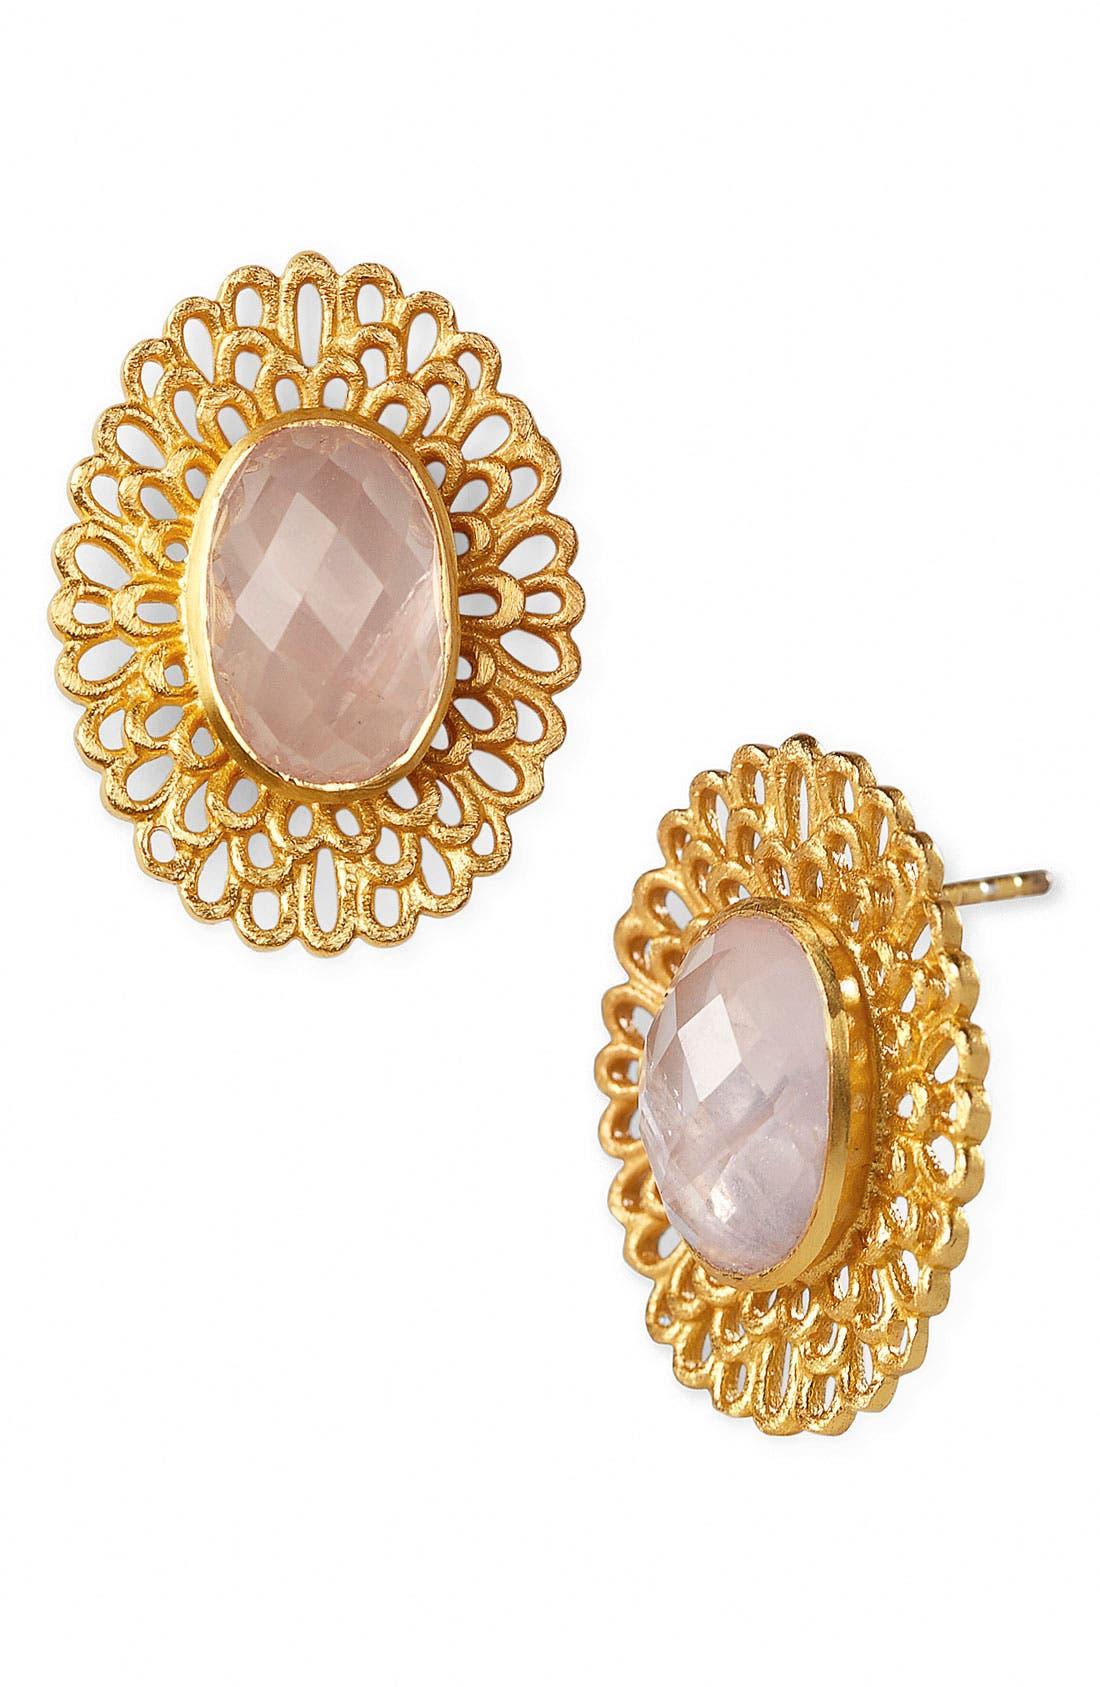 Main Image - Argento Vivo 'Garden' Oval Stone Stud Earrings